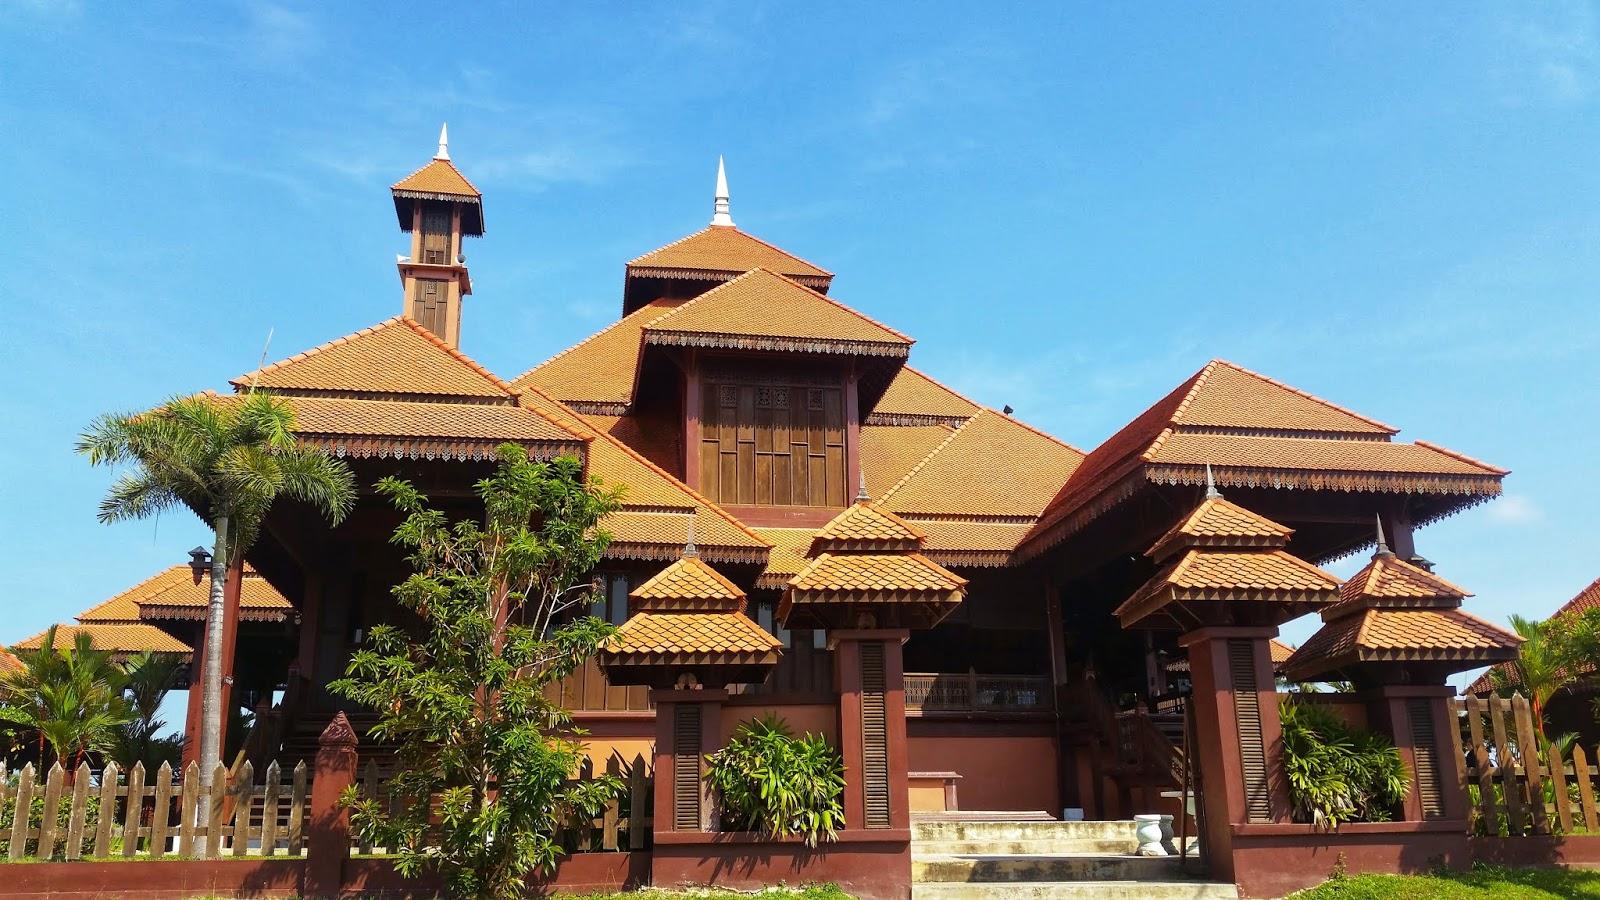 Masjid Ulul Albab di Jertih, Terengganu